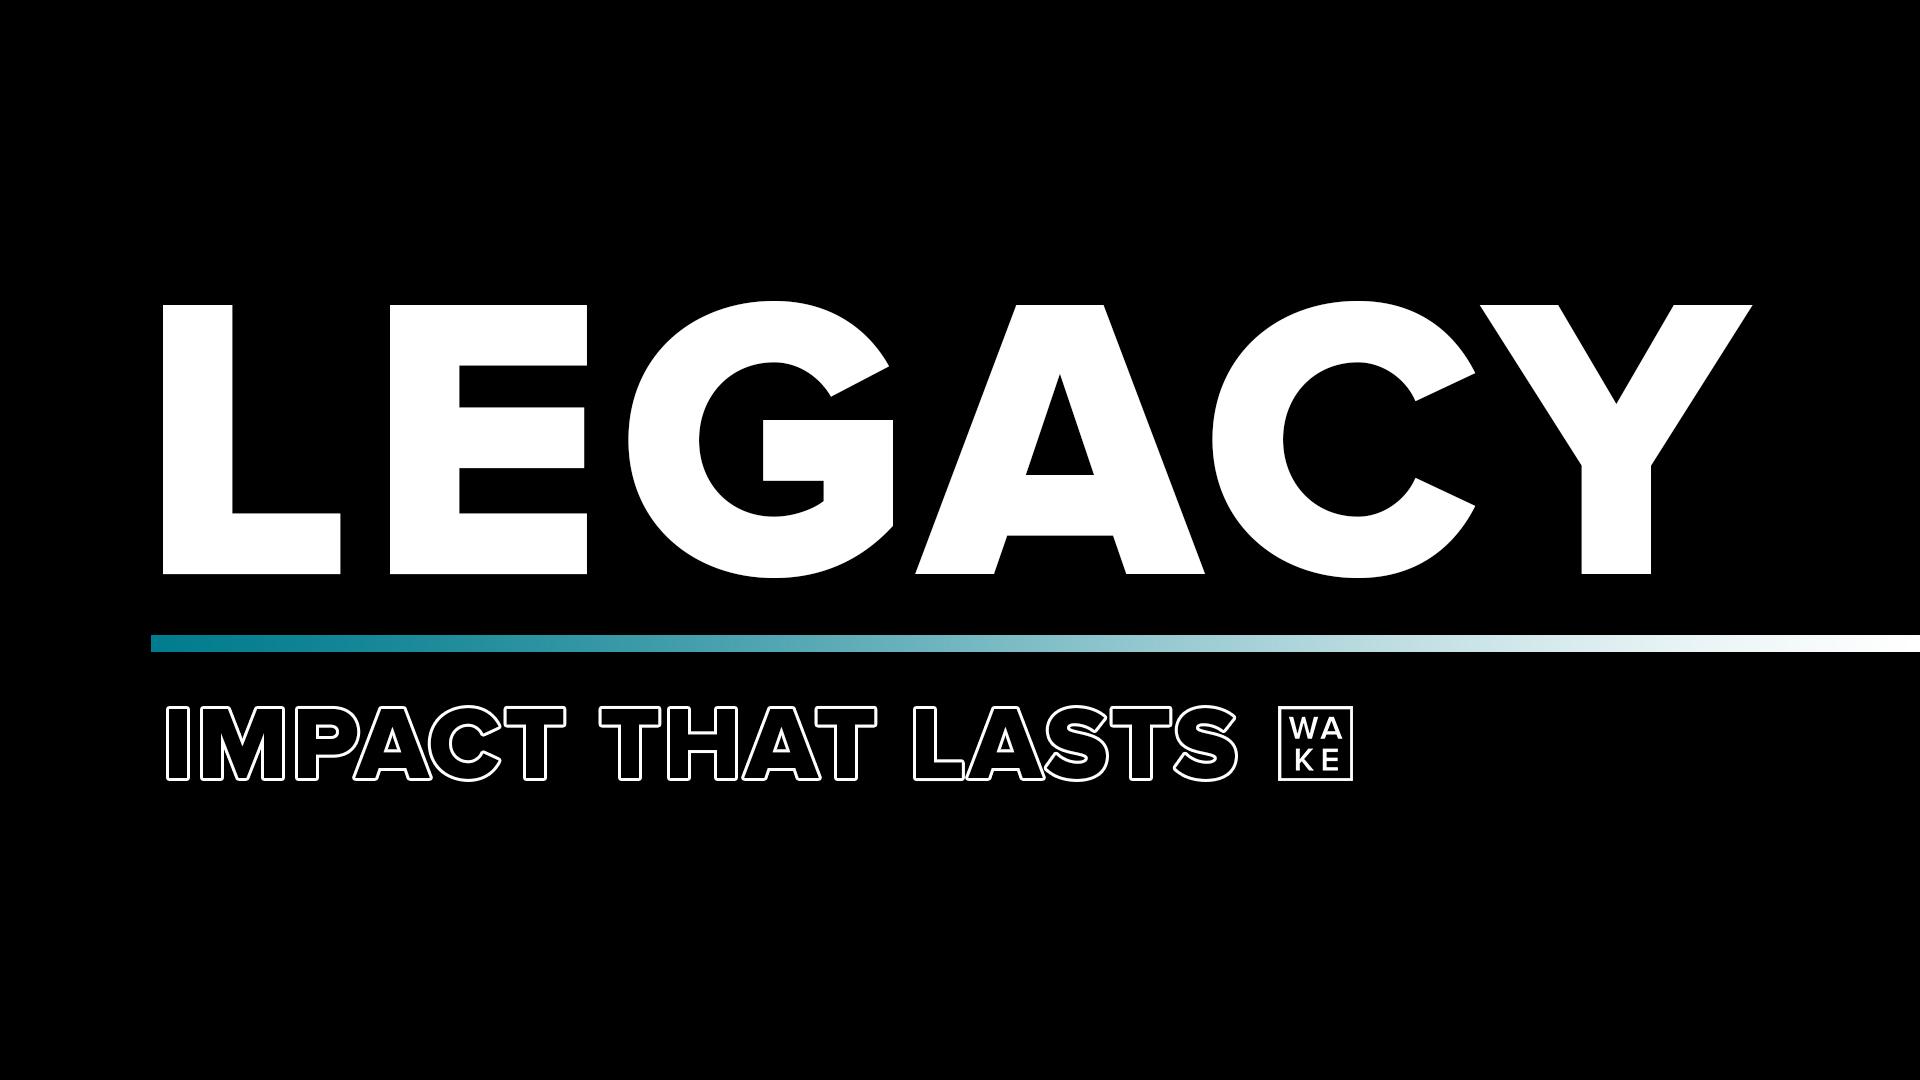 LEGACY_Series_V3_Black.jpg